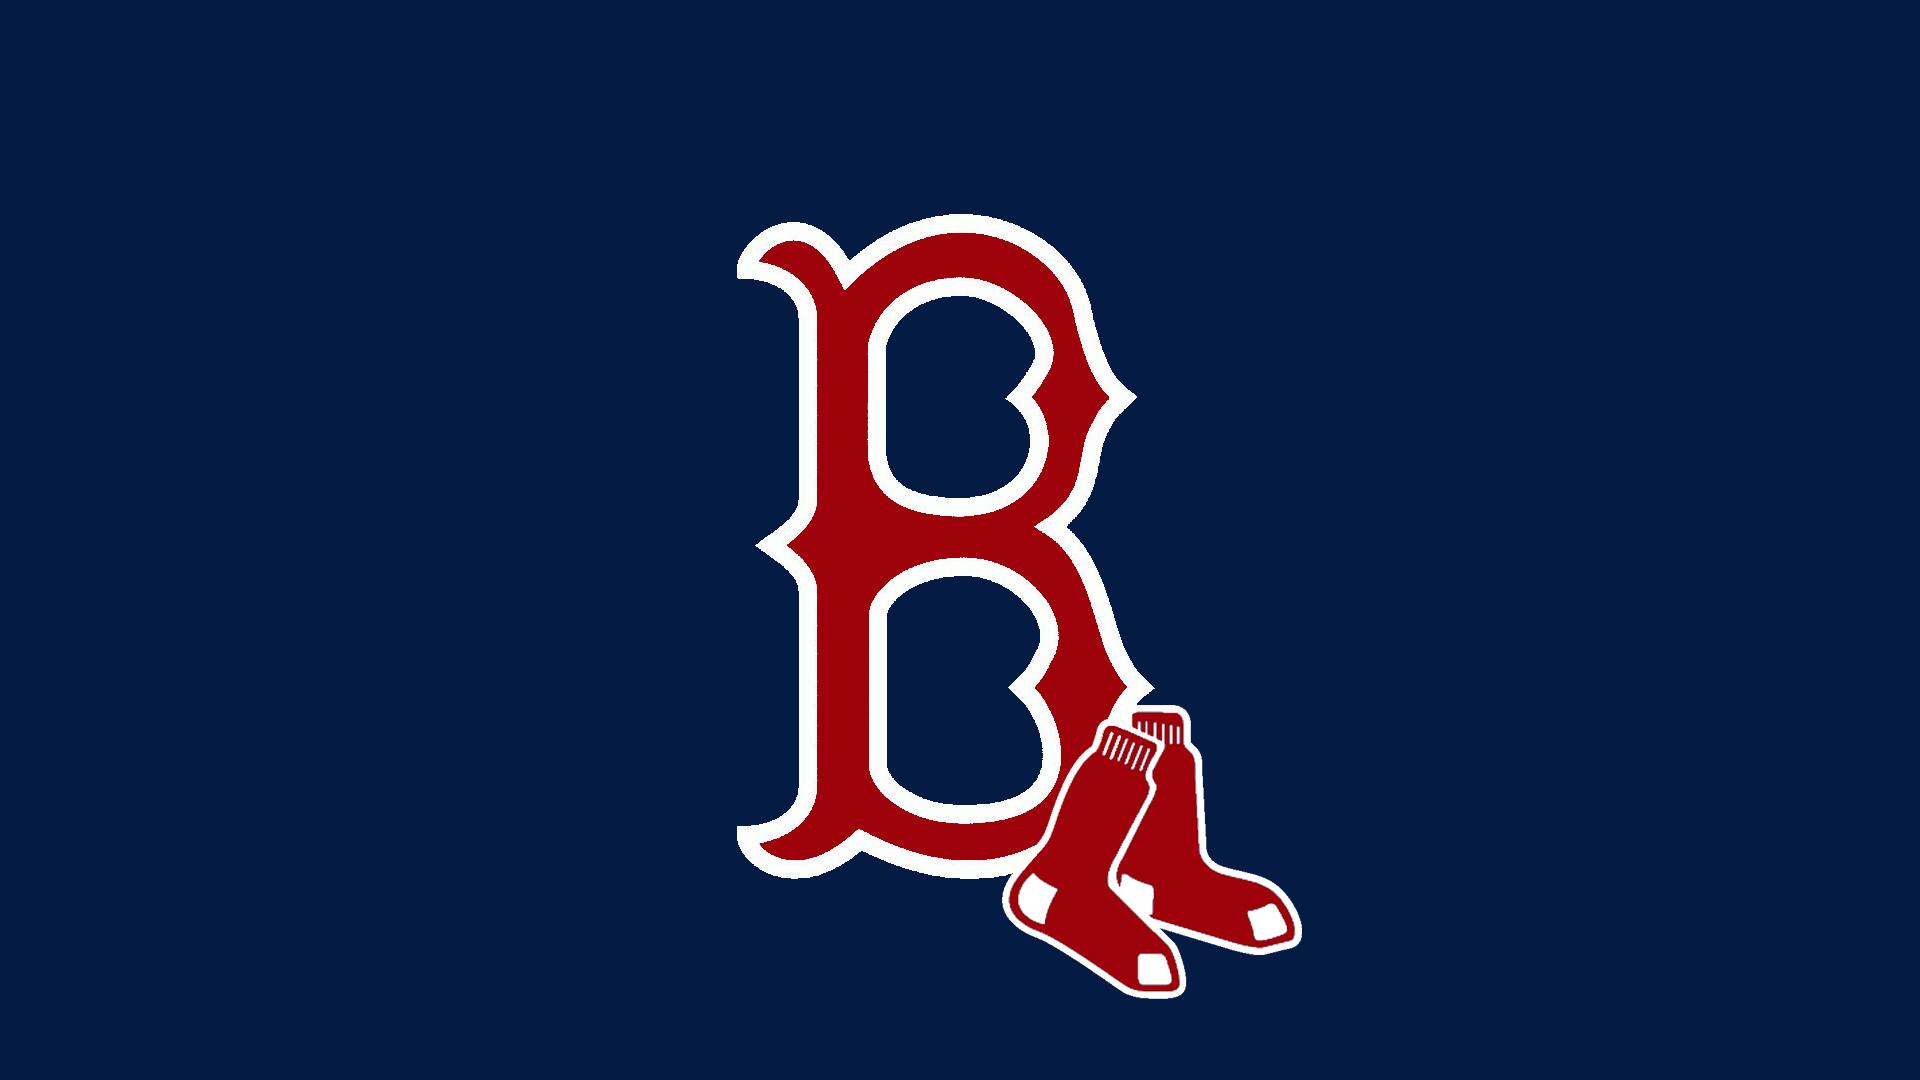 Red Sox Wallpaper 1920x1080   Boston Red Sox Wallpaper 8502641 1920x1080